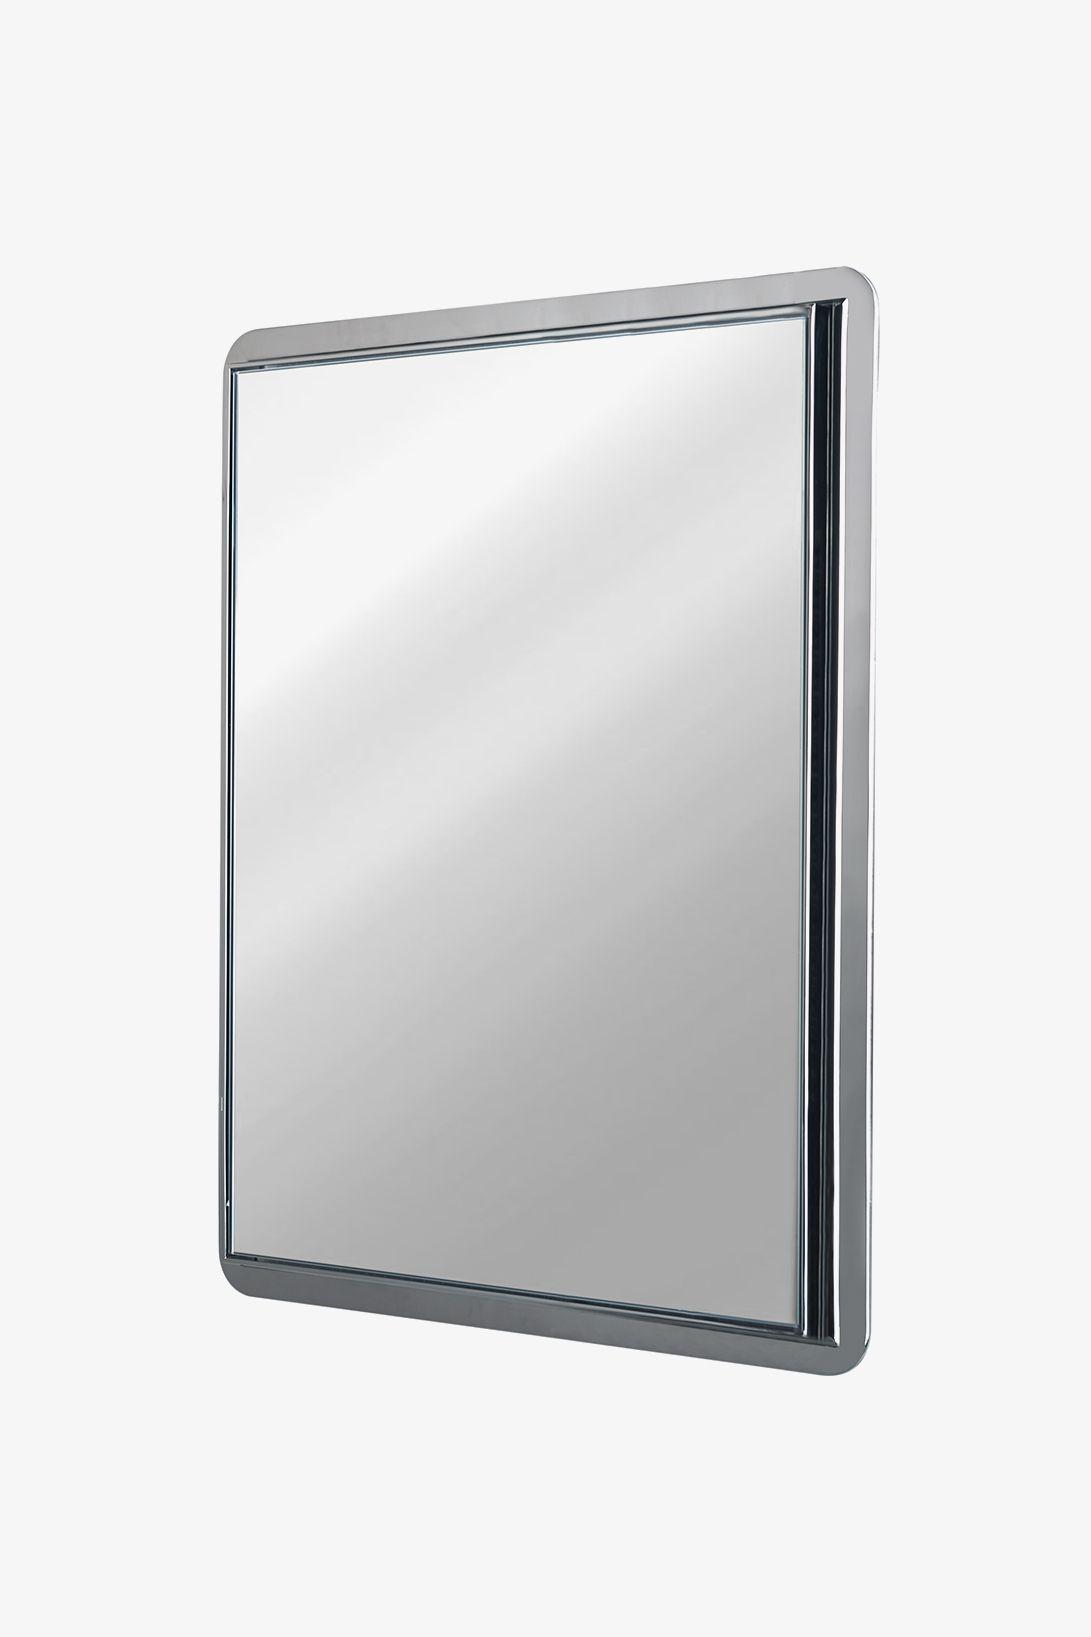 Formwork Wall Mounted Stationary Mirror 24 X 32 1 4 X 1 1 2 Mirror Wall Mount Luxury Mirror